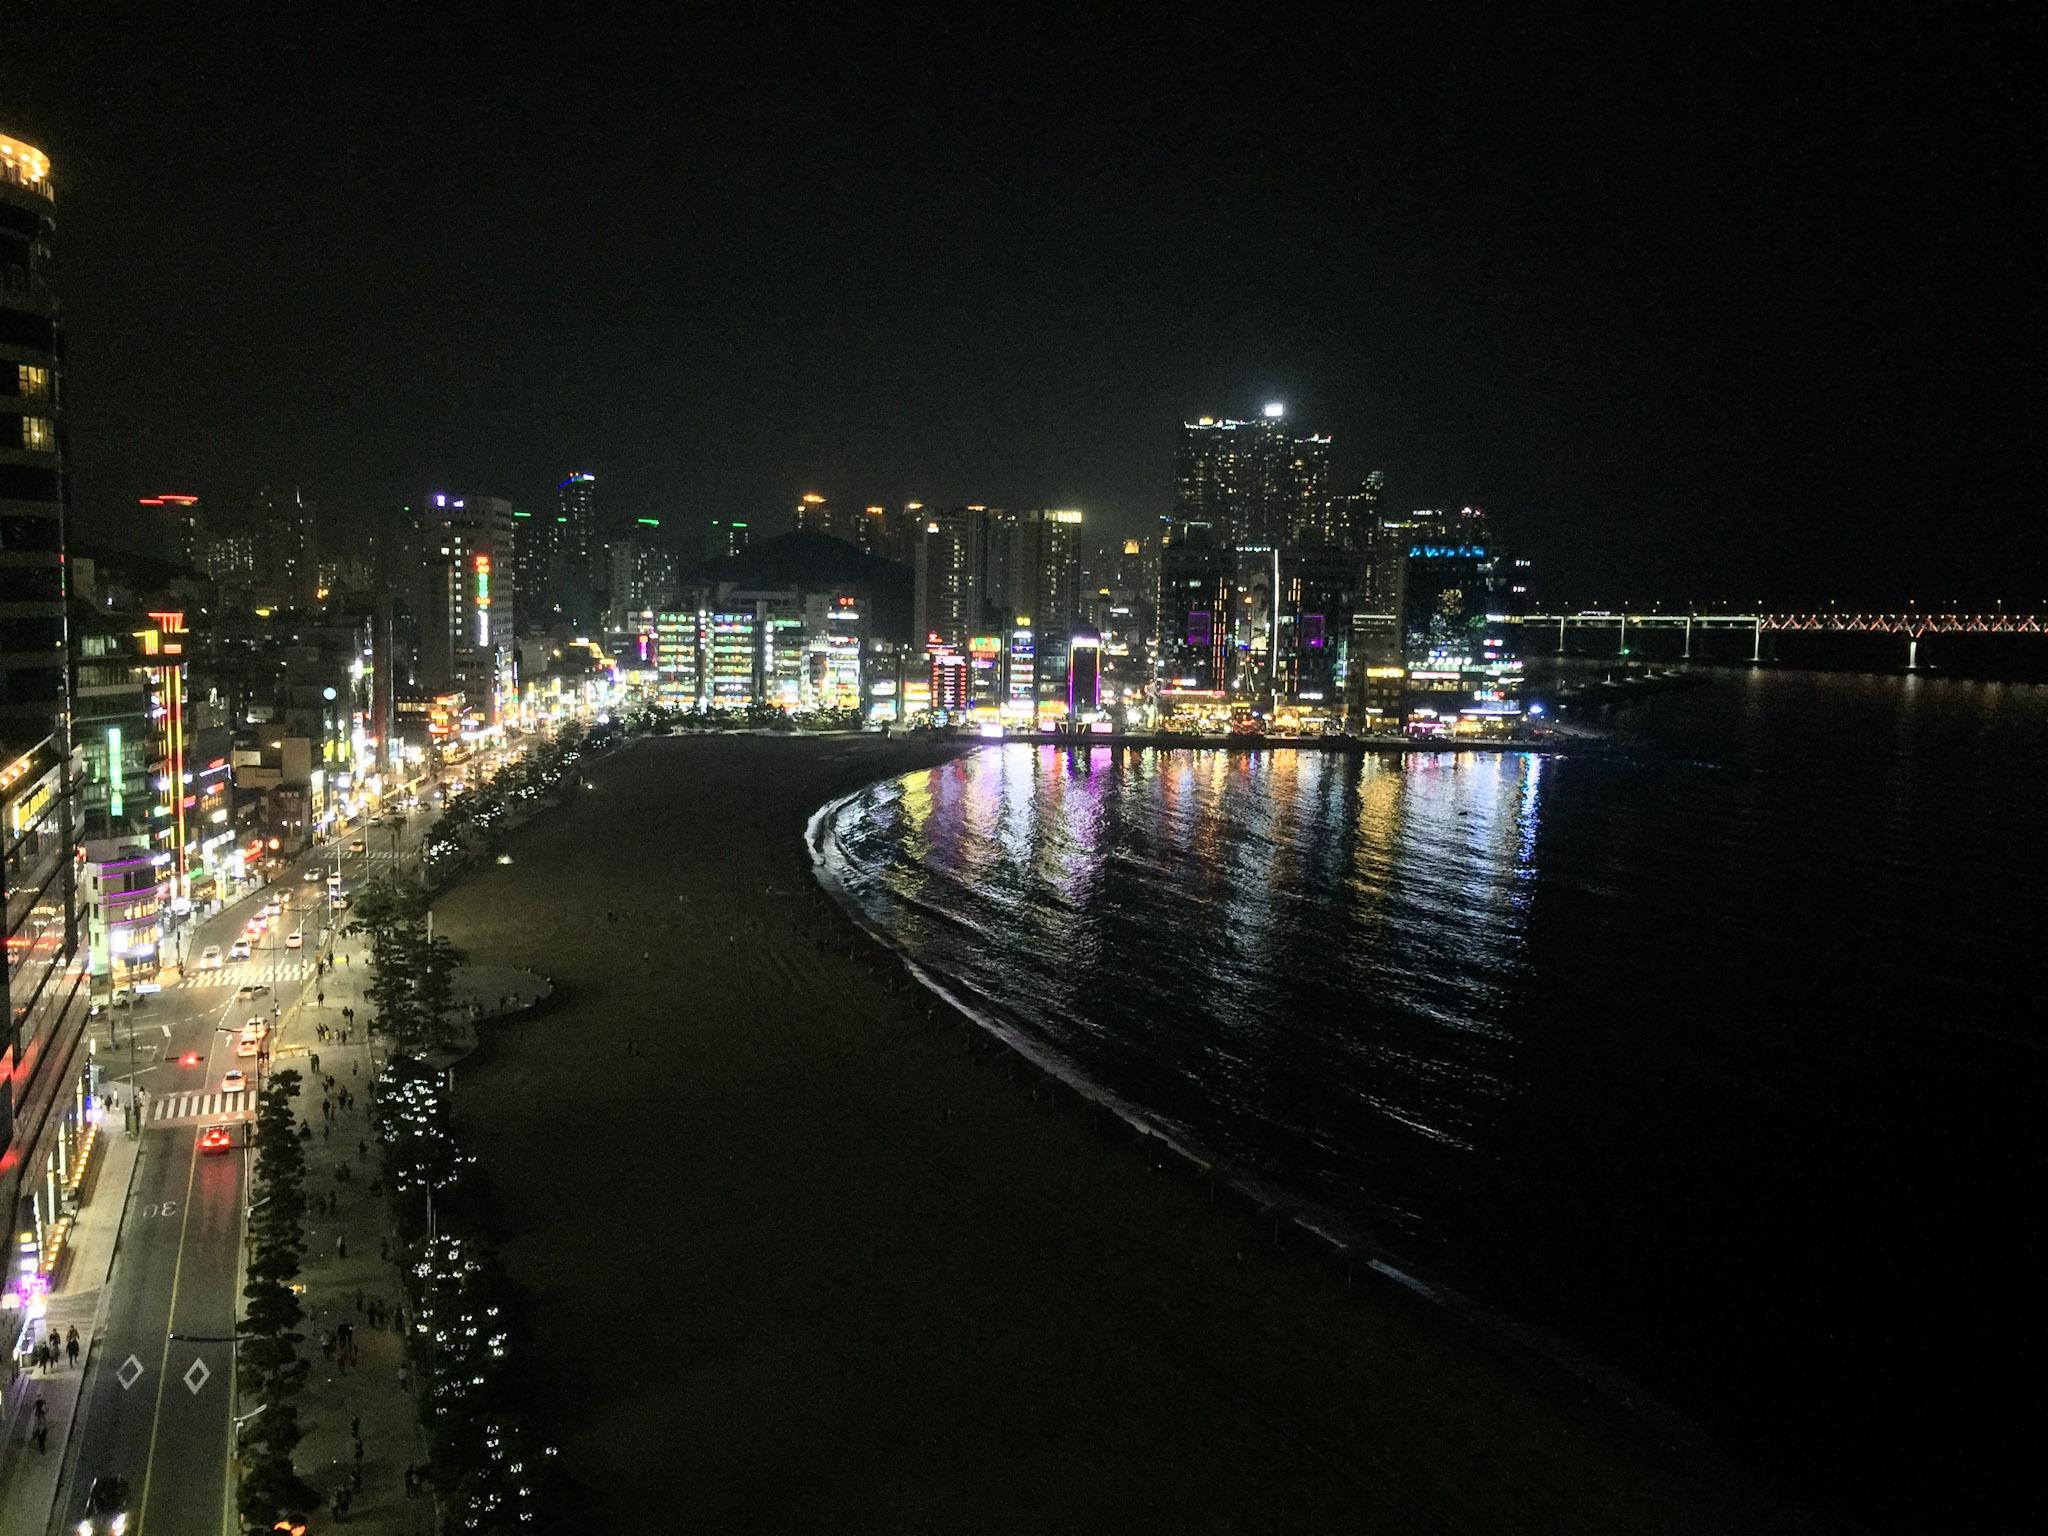 gwangalli_beach_by_night